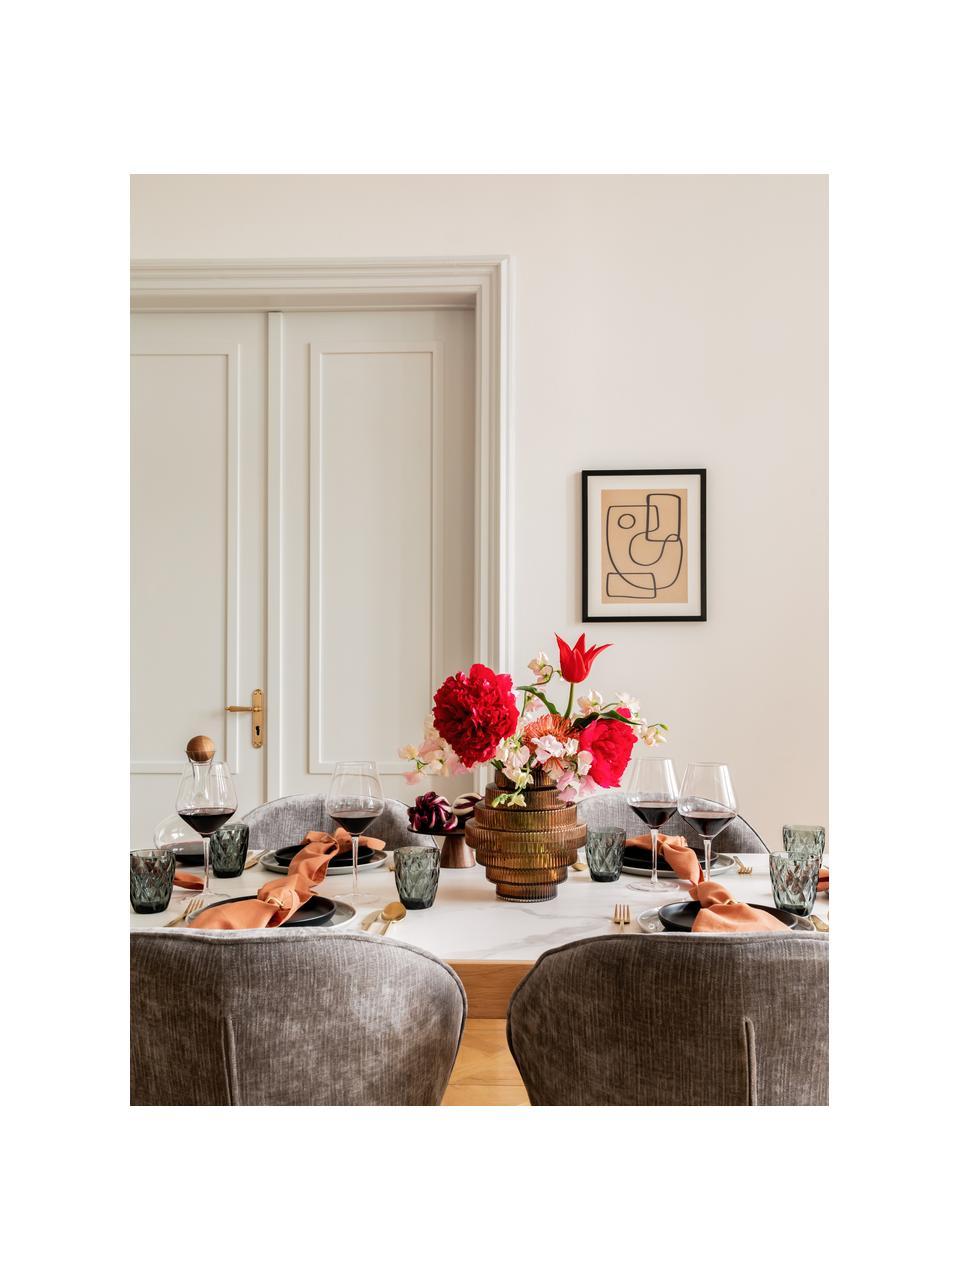 Mondgeblazen bolvormige rode wijnglazen Ays, 4 stuks, Glas, Transparant, Ø 7 x H 25 cm